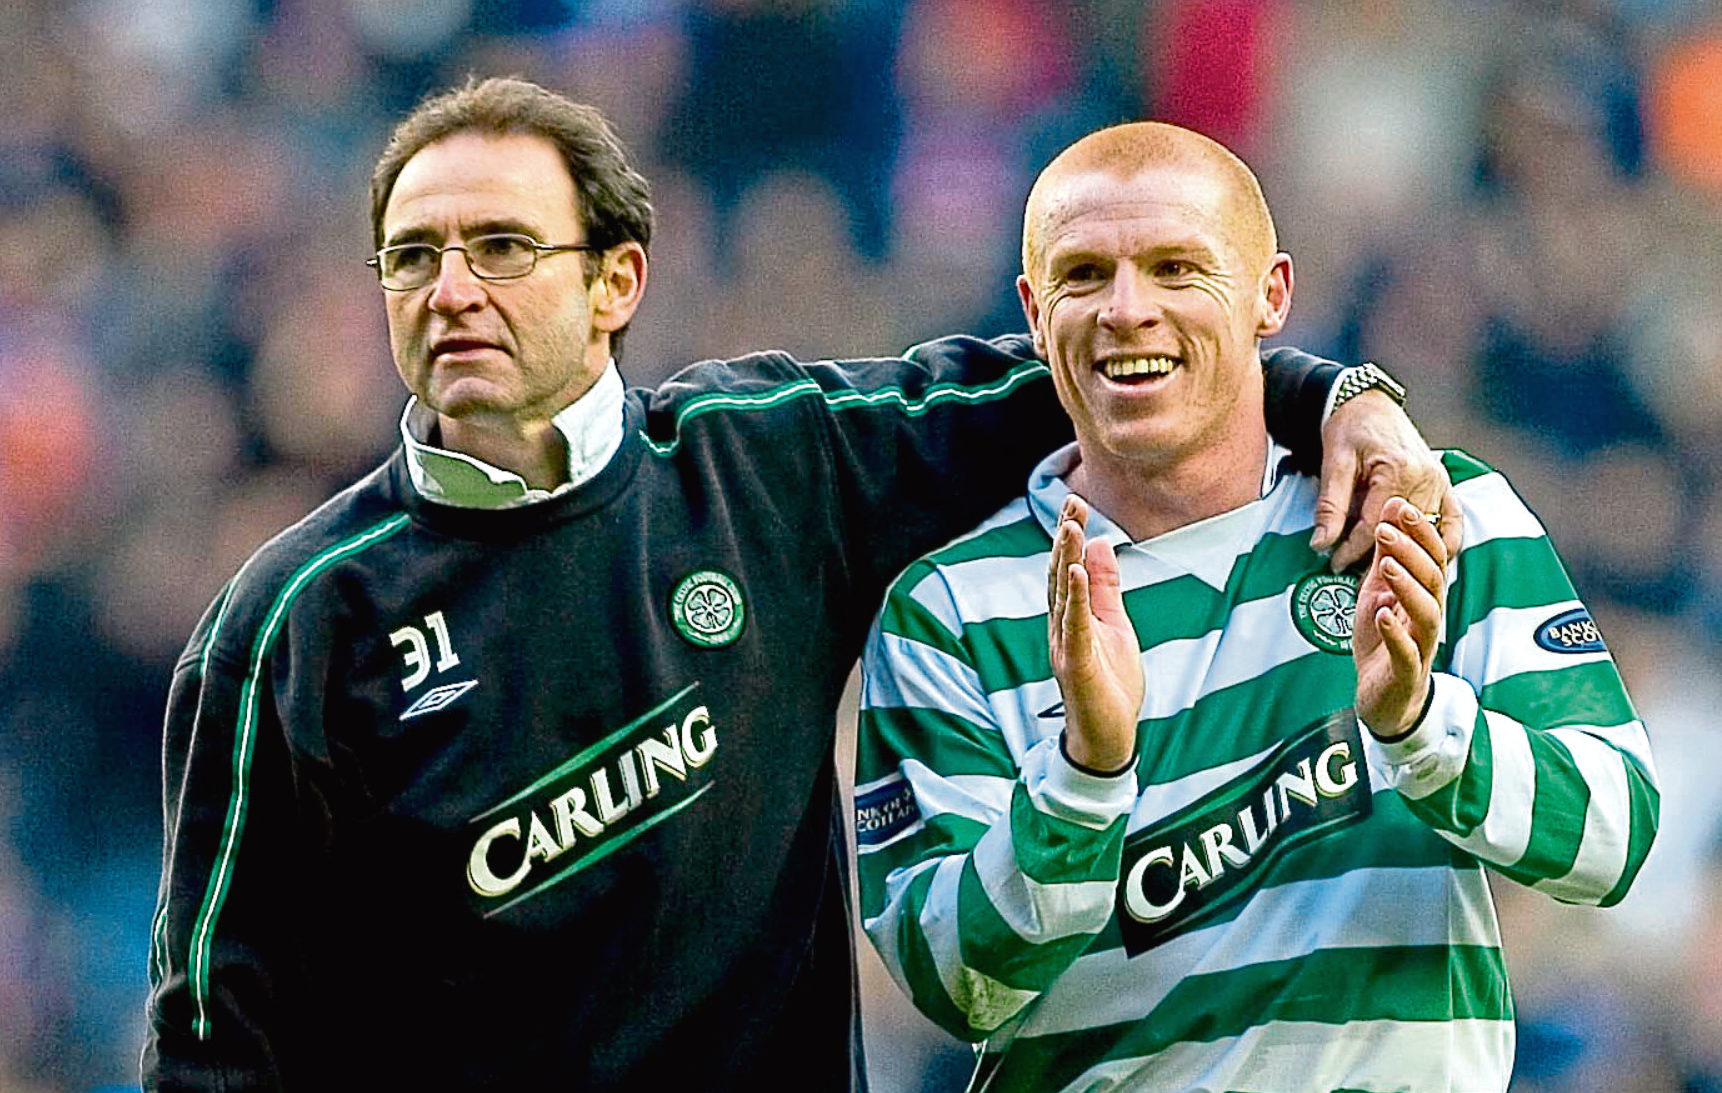 Martin O'Neill (left) with Neil Lennon in 2004